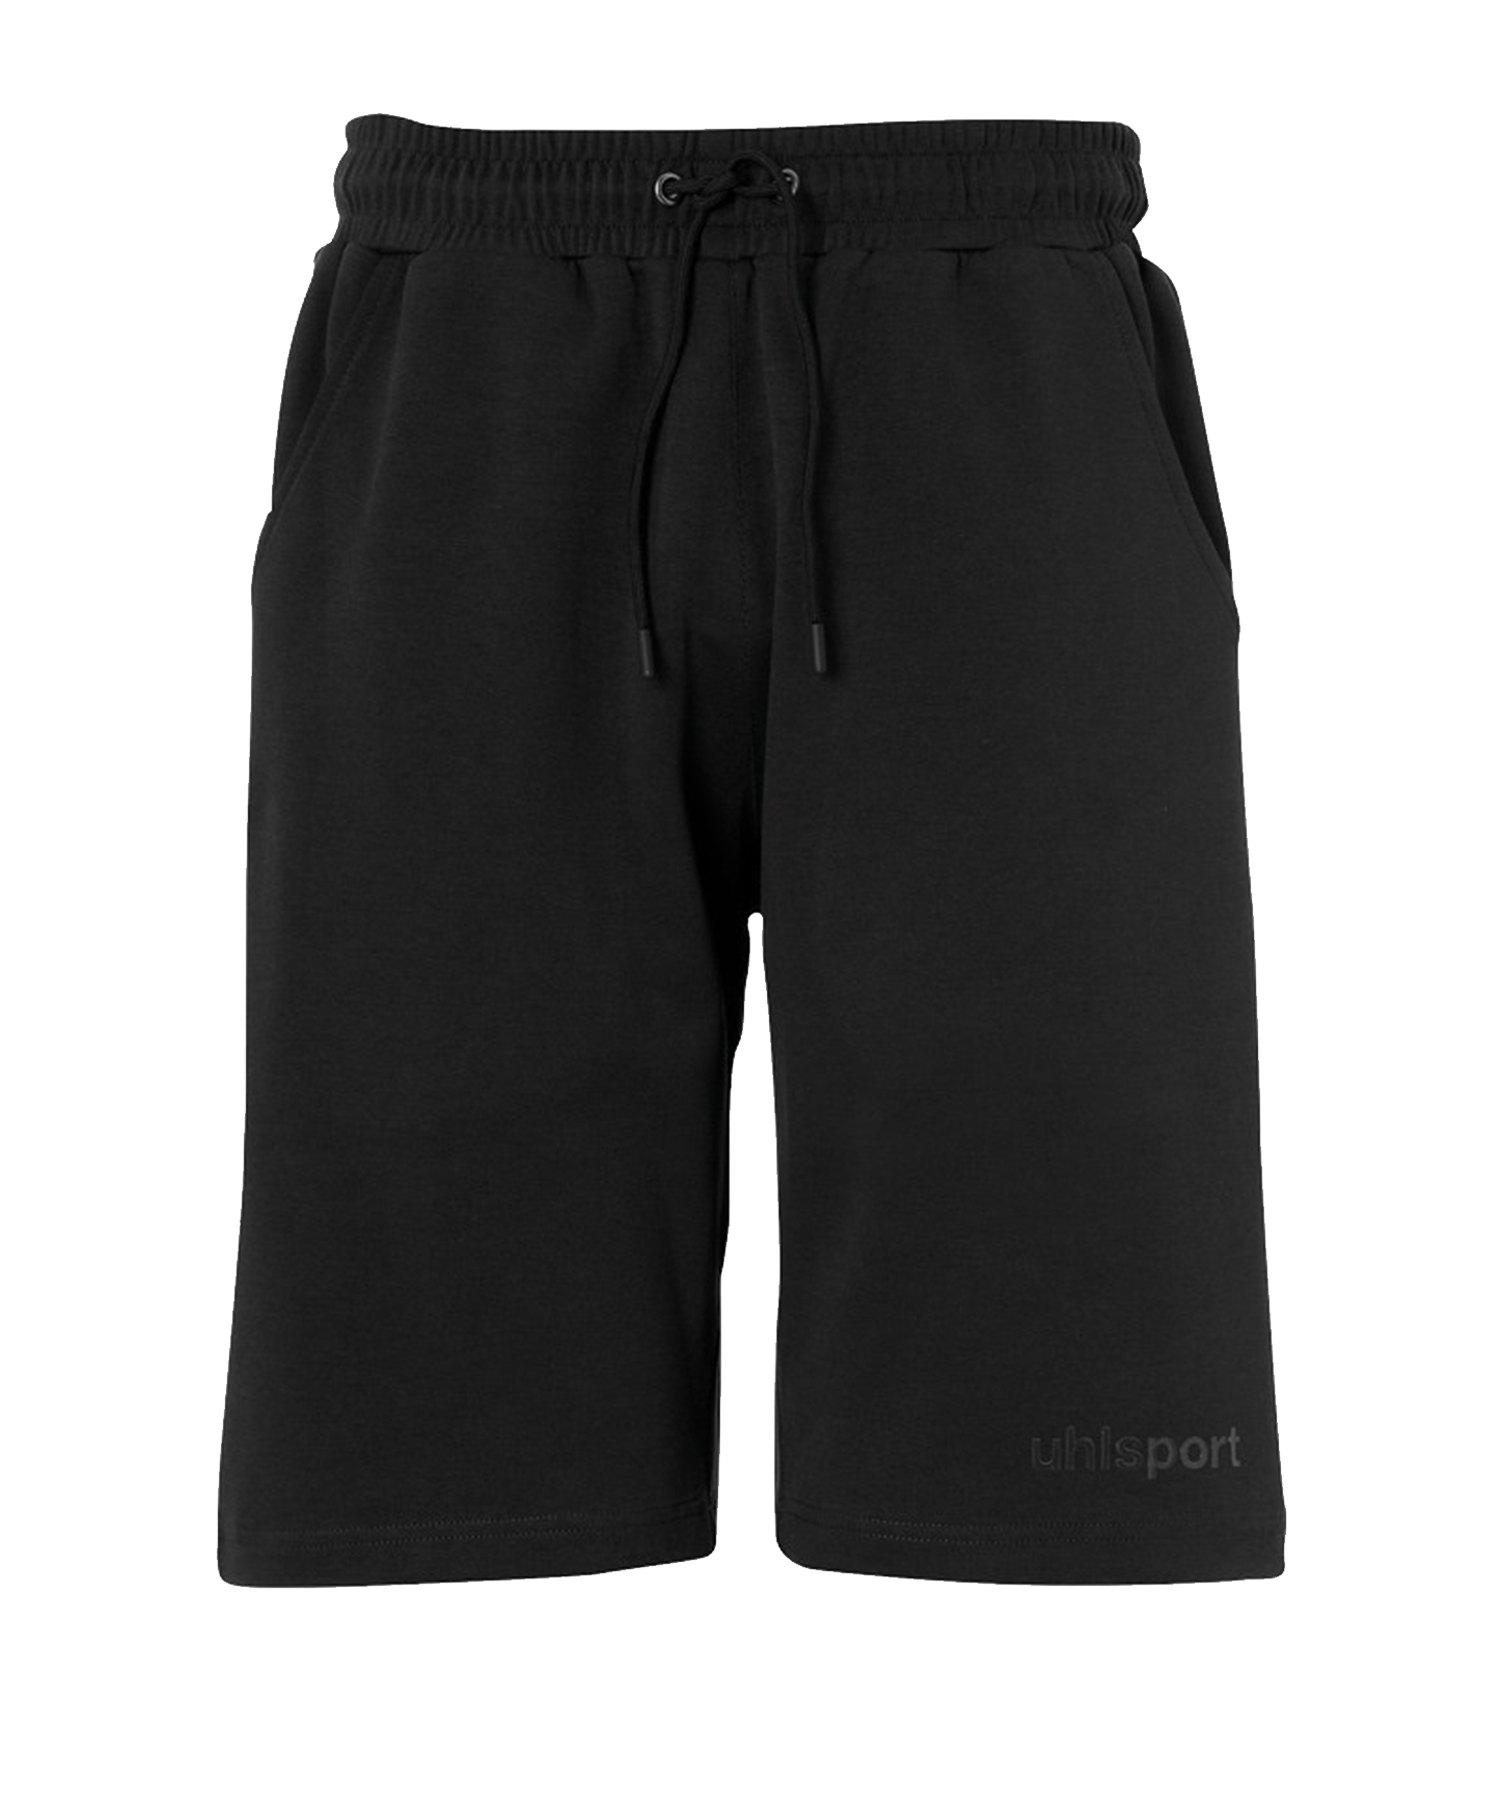 Uhlsport Essential Pro Short Hose kurz F01 - Schwarz